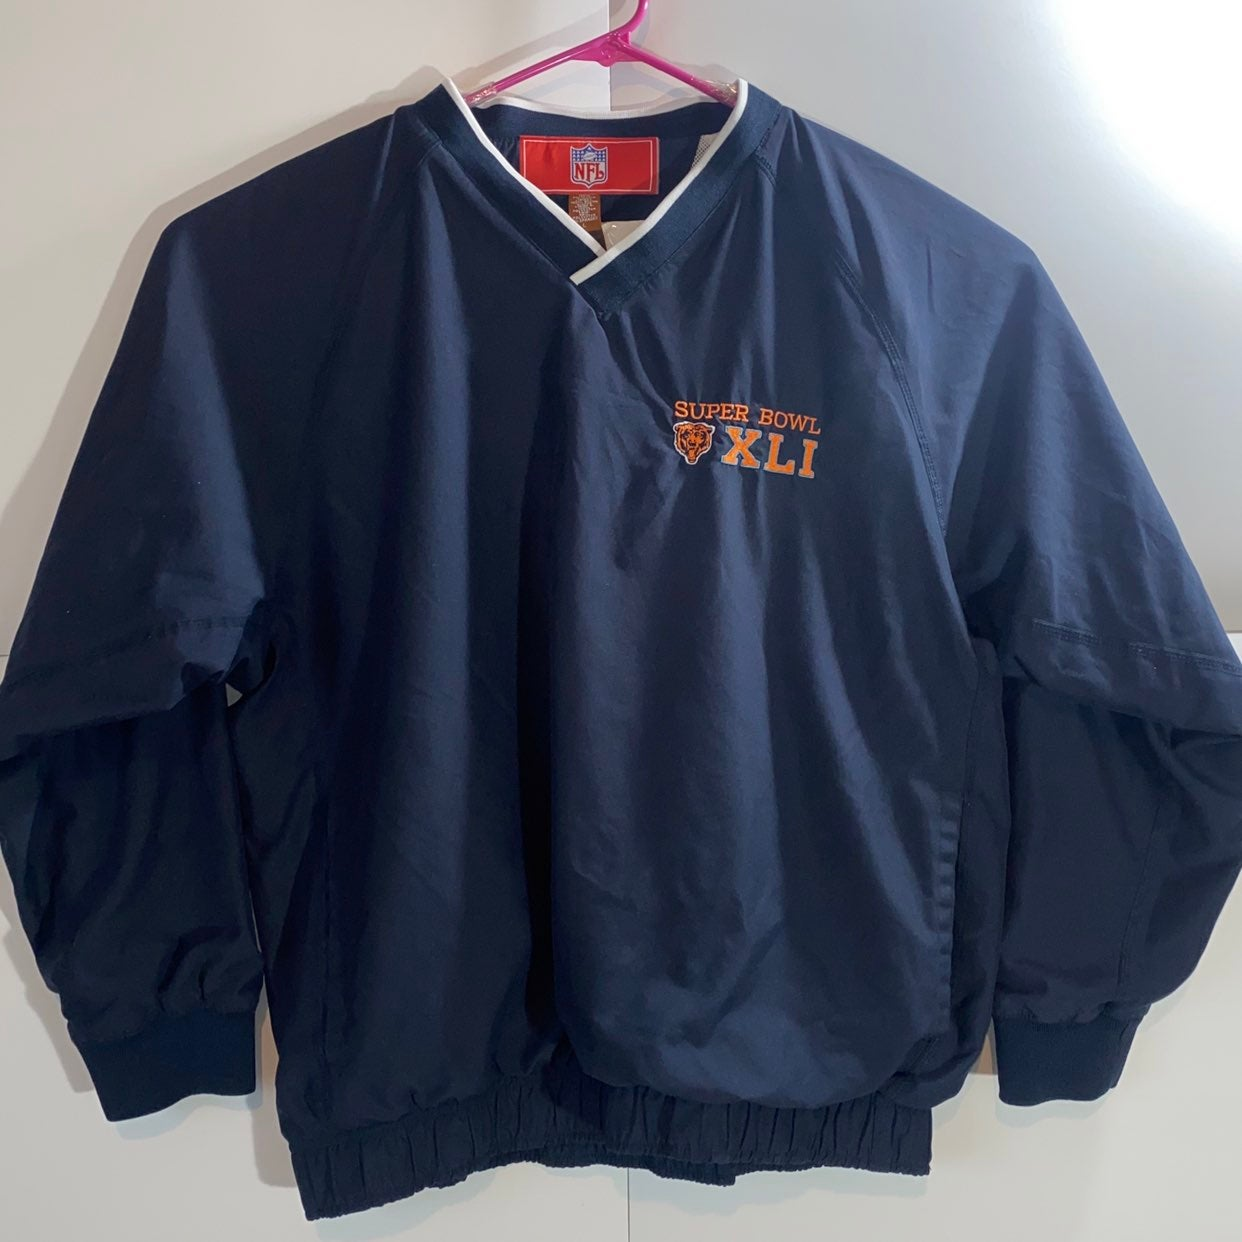 Chicago Bears Super Bowl XLI Jacket